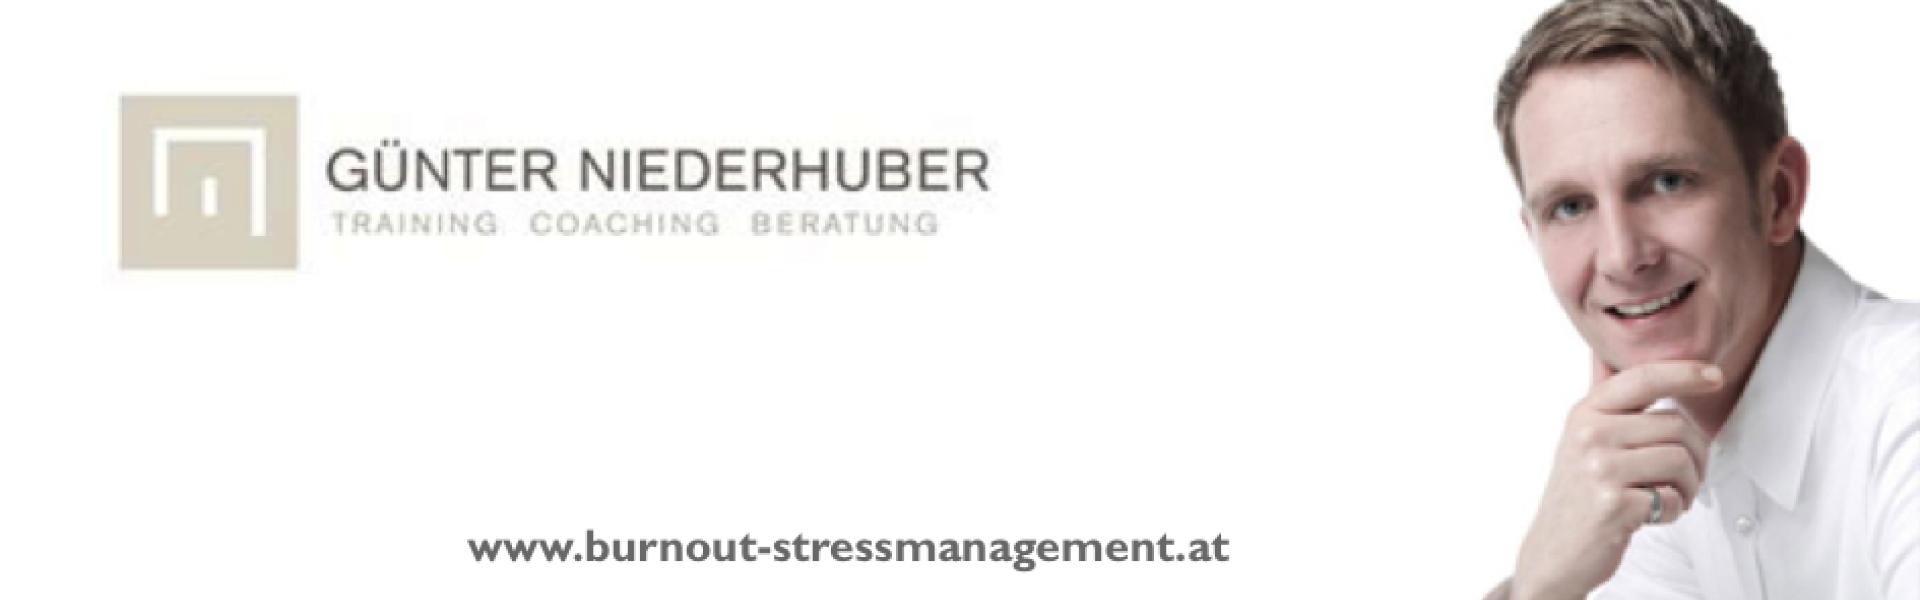 Günter Niederhuber cover